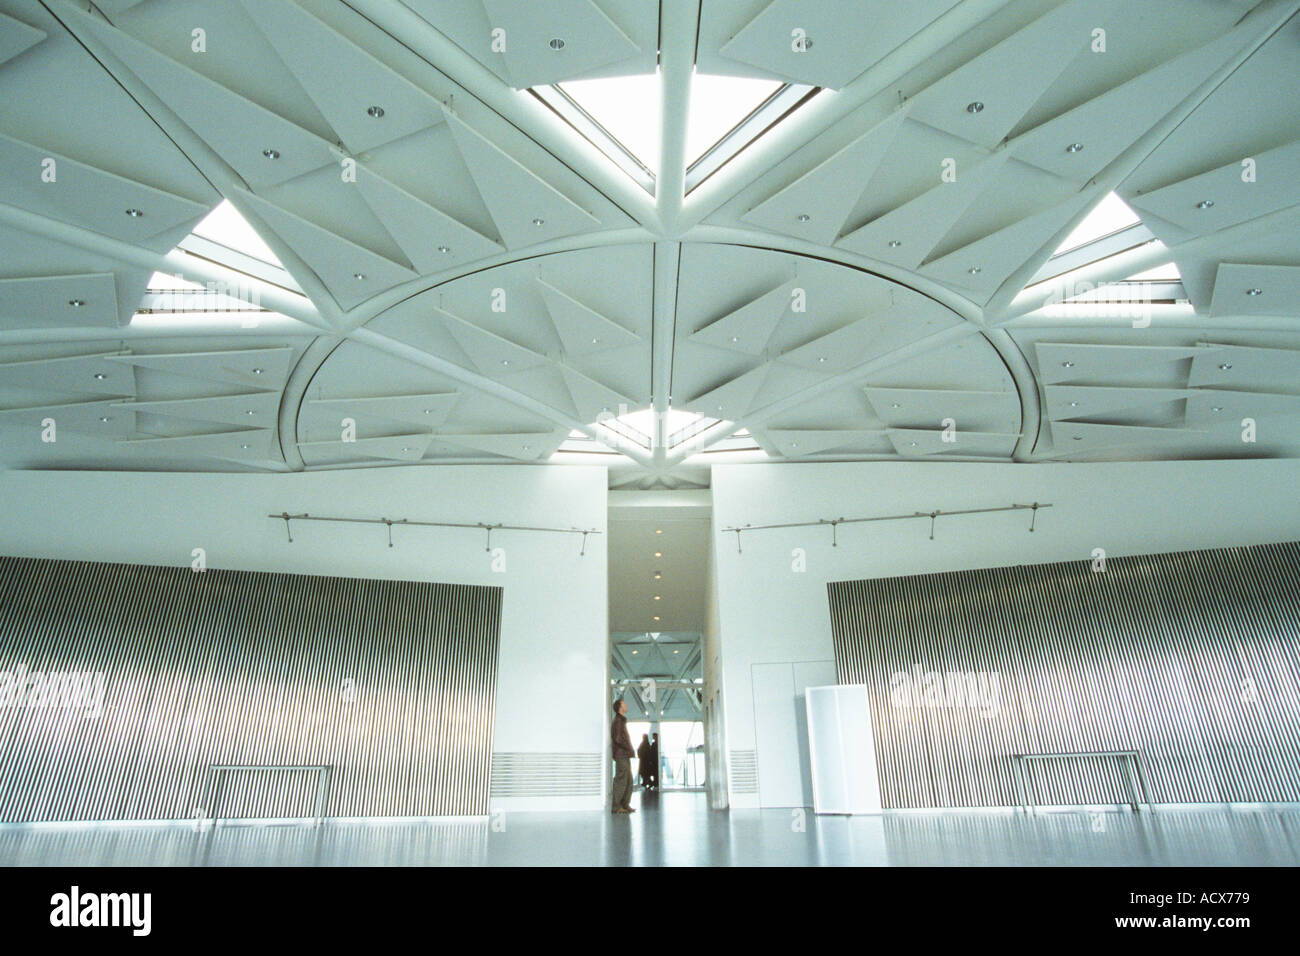 London Assembly Building, London, UK - Stock Image